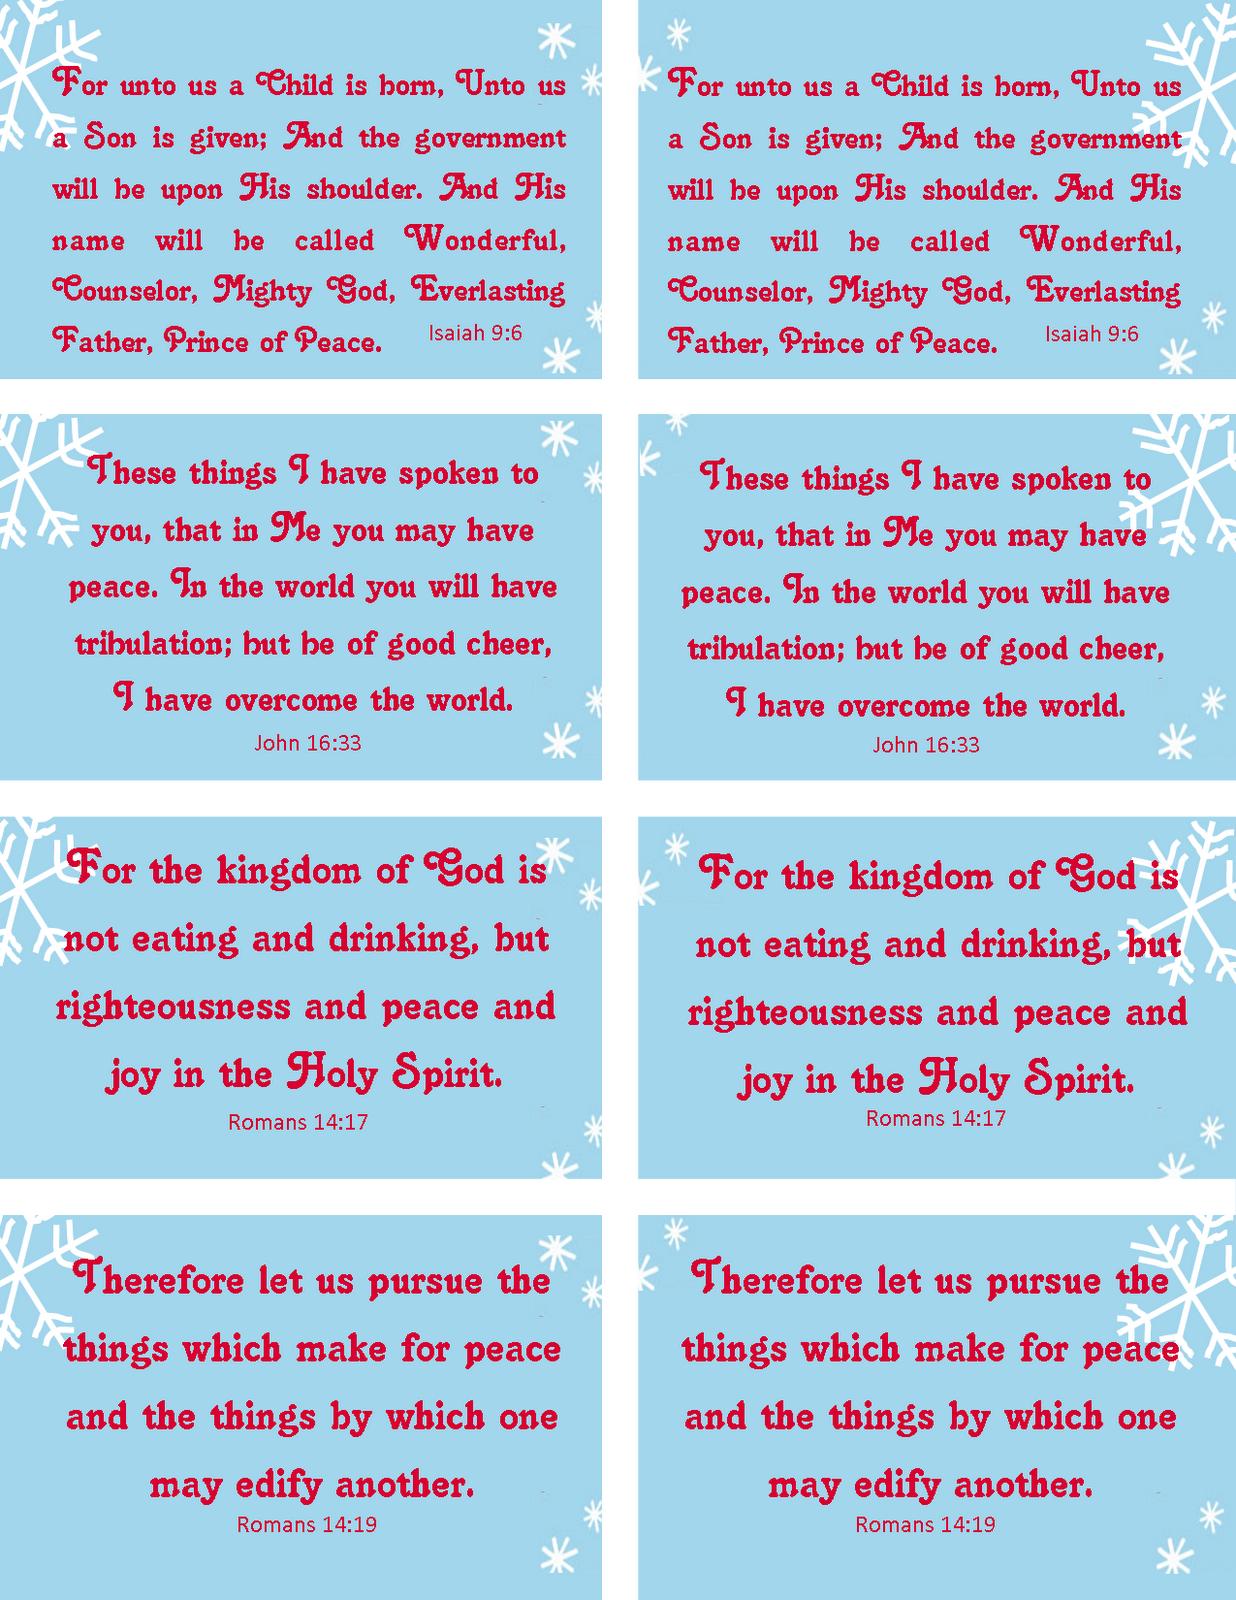 httpdldropboxcomu50589689christmas20verse20cardspdf - Christmas Scripture For Cards